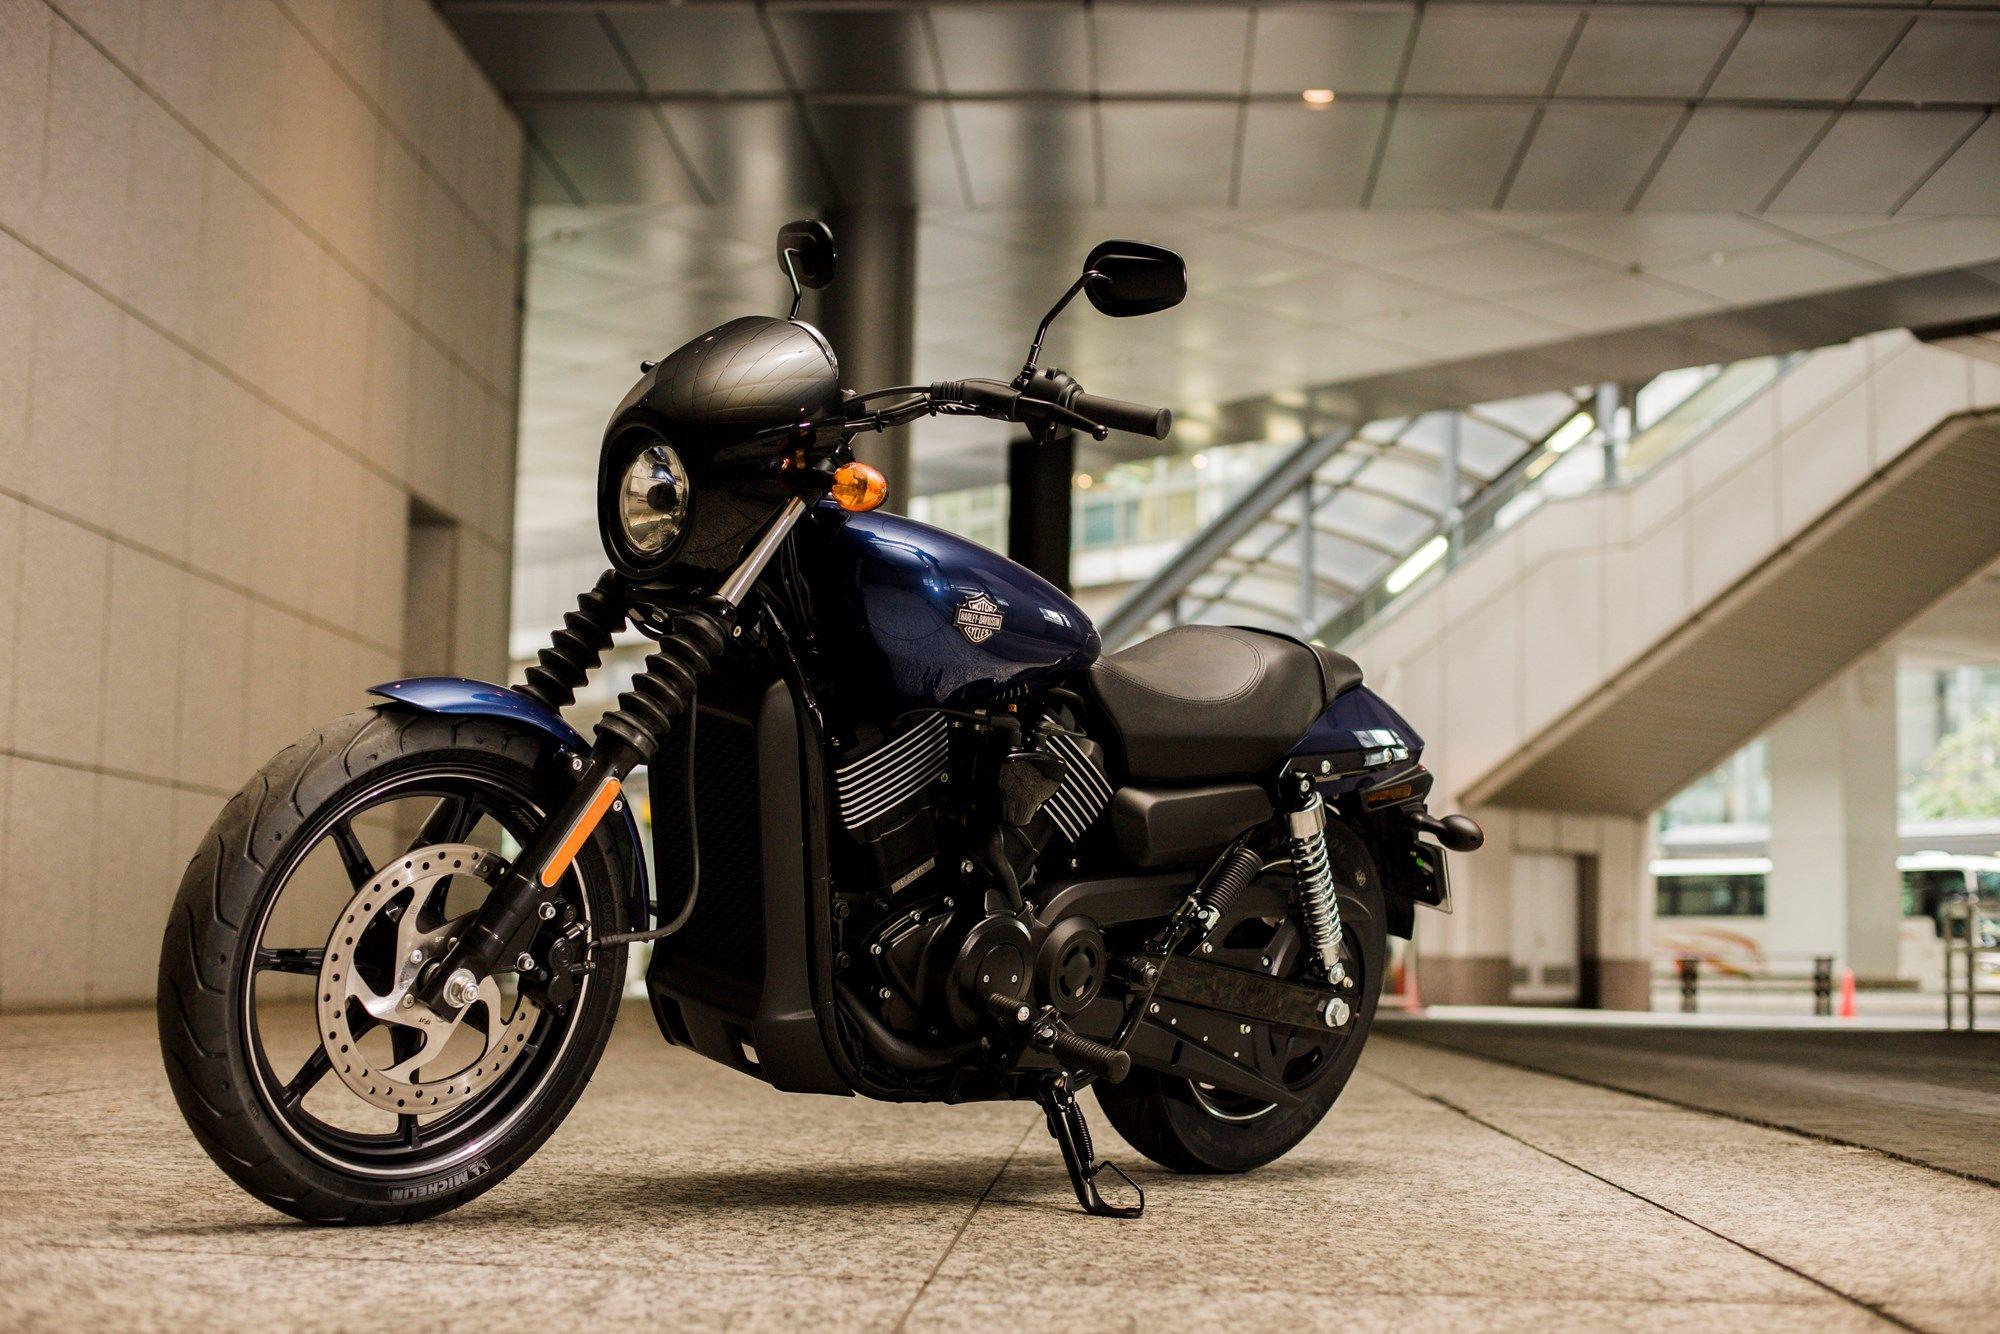 Harley davidson bikes in india list of latest harley davidson bikes prices models